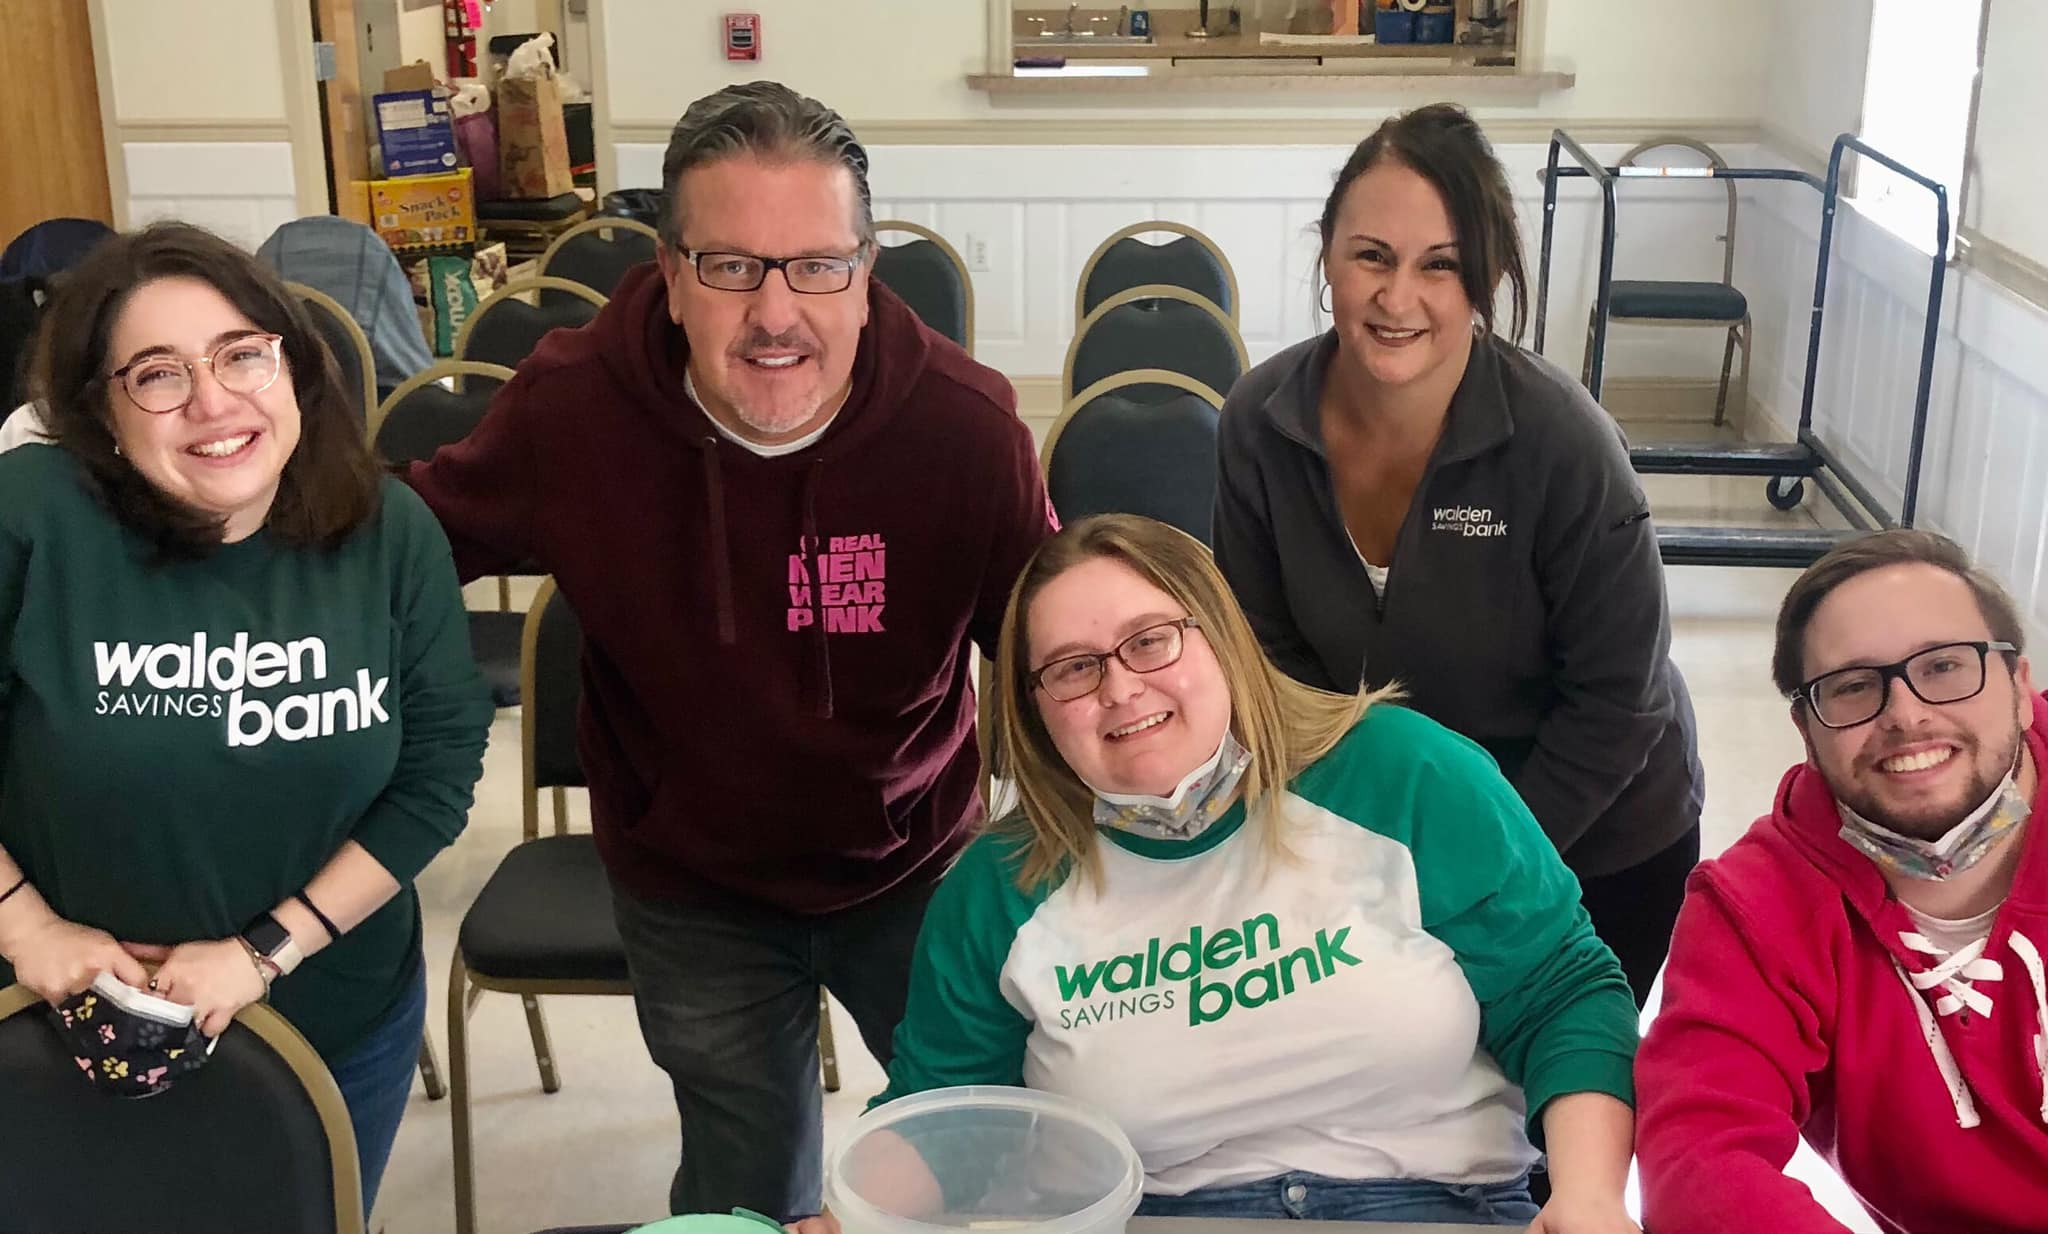 WALDEN SAVINGS BANK VOLUNTEERS FOR LOCAL ORGANIZATION